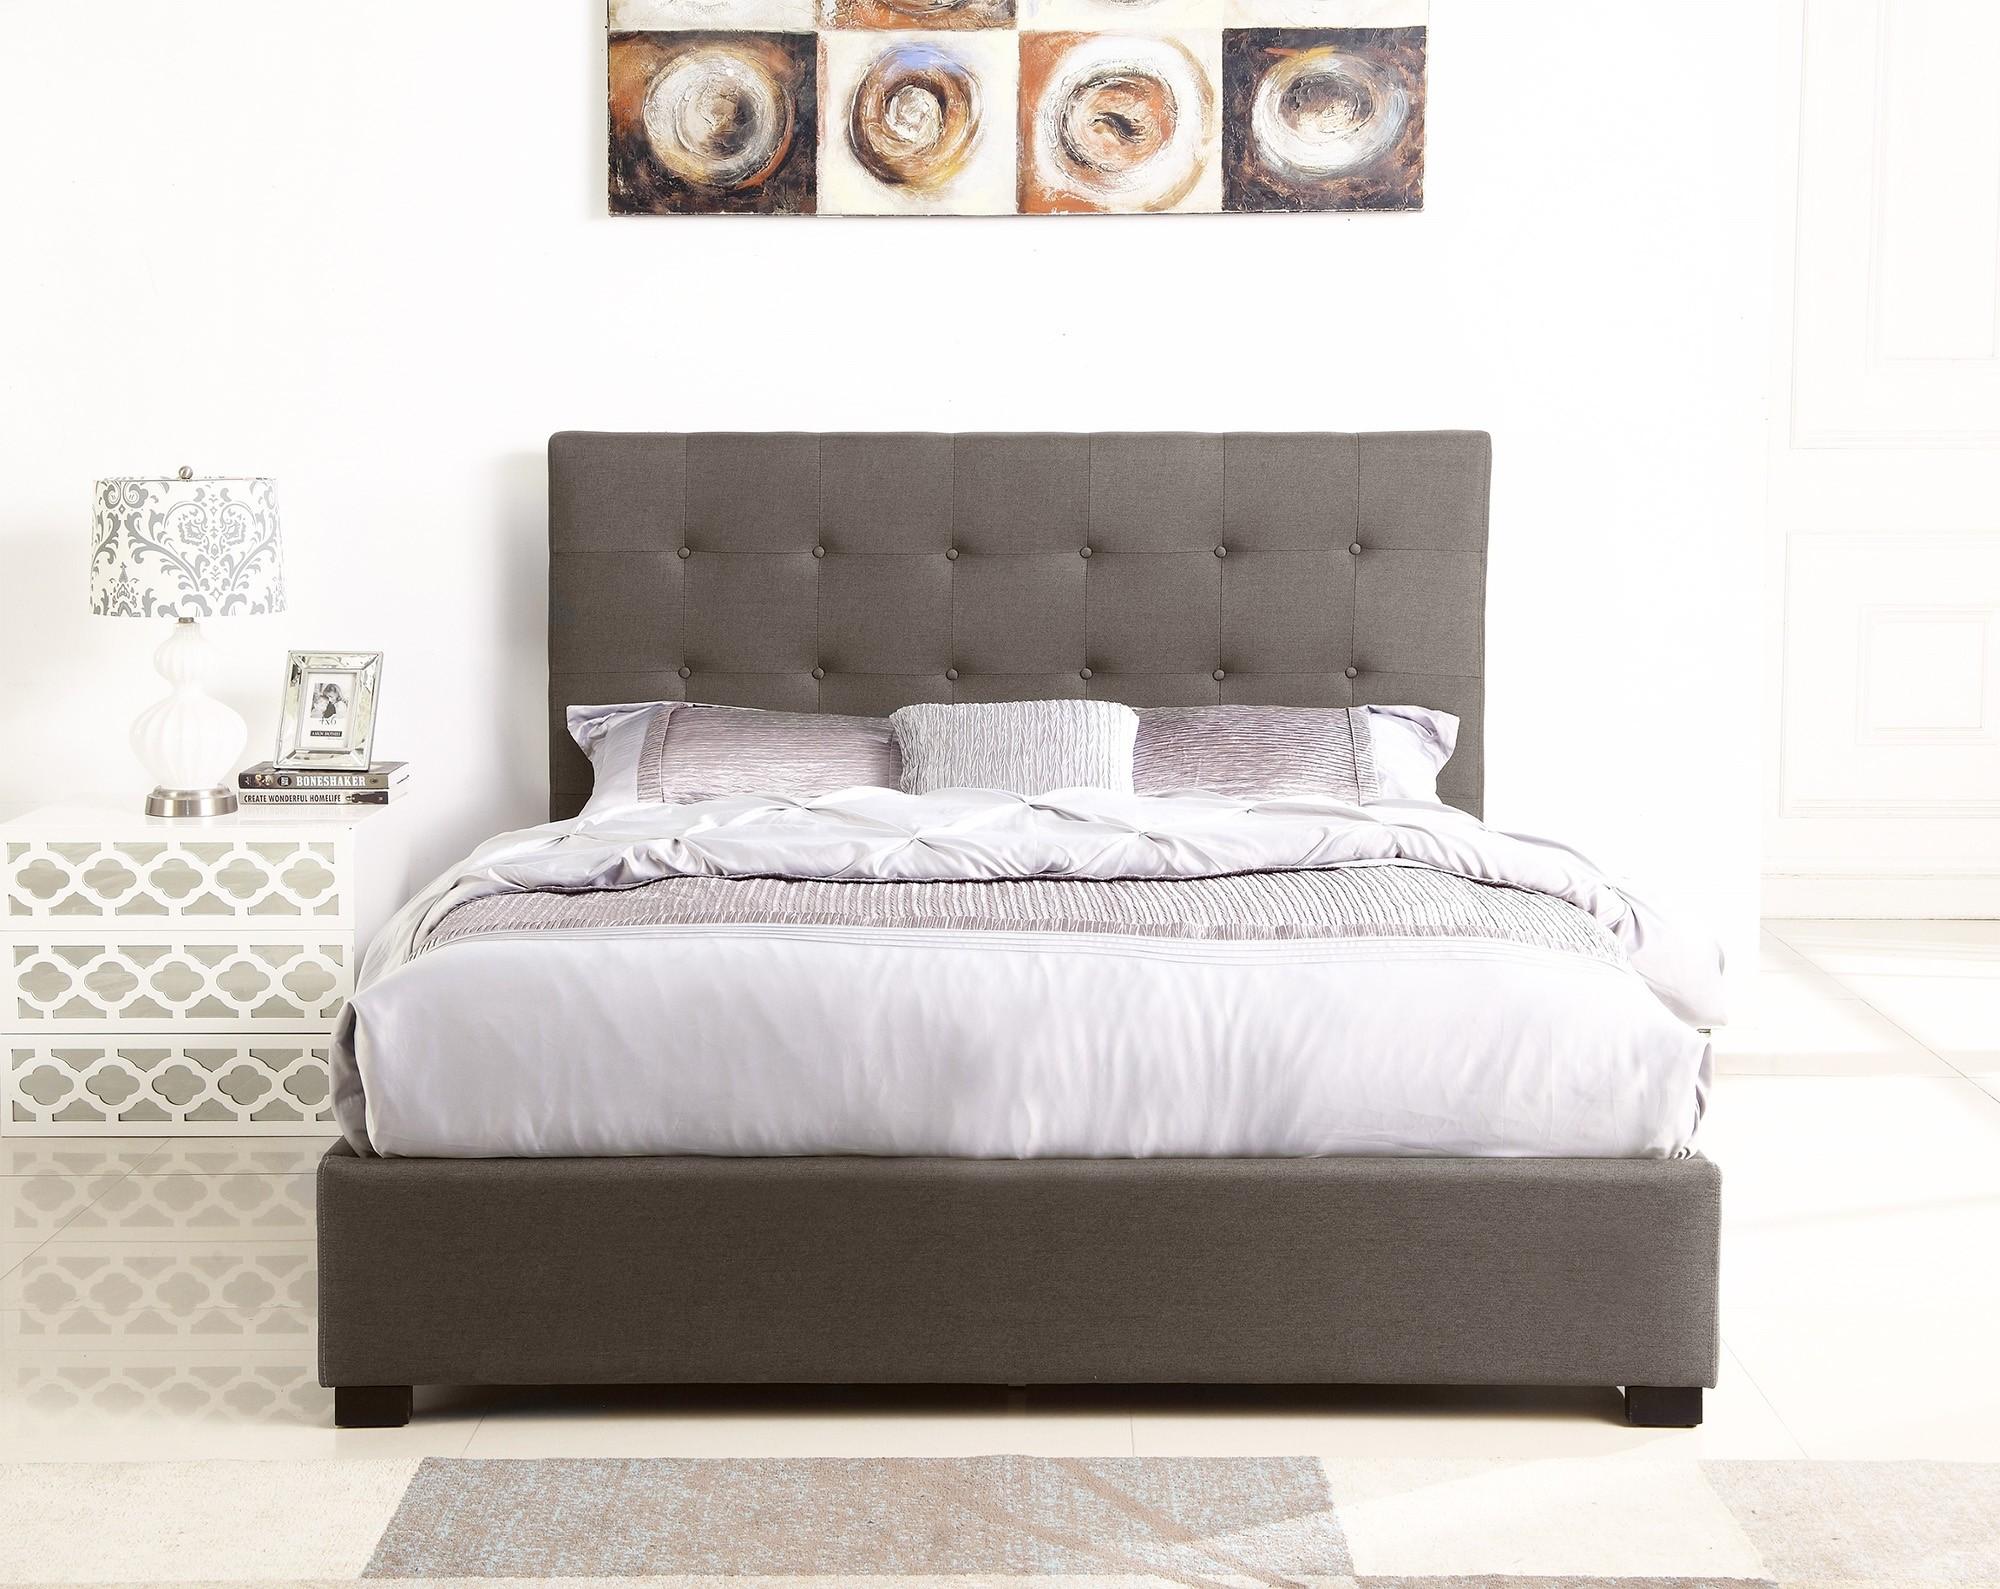 lit coffre layton sommier 160cm tissu taupe lits 2 places. Black Bedroom Furniture Sets. Home Design Ideas